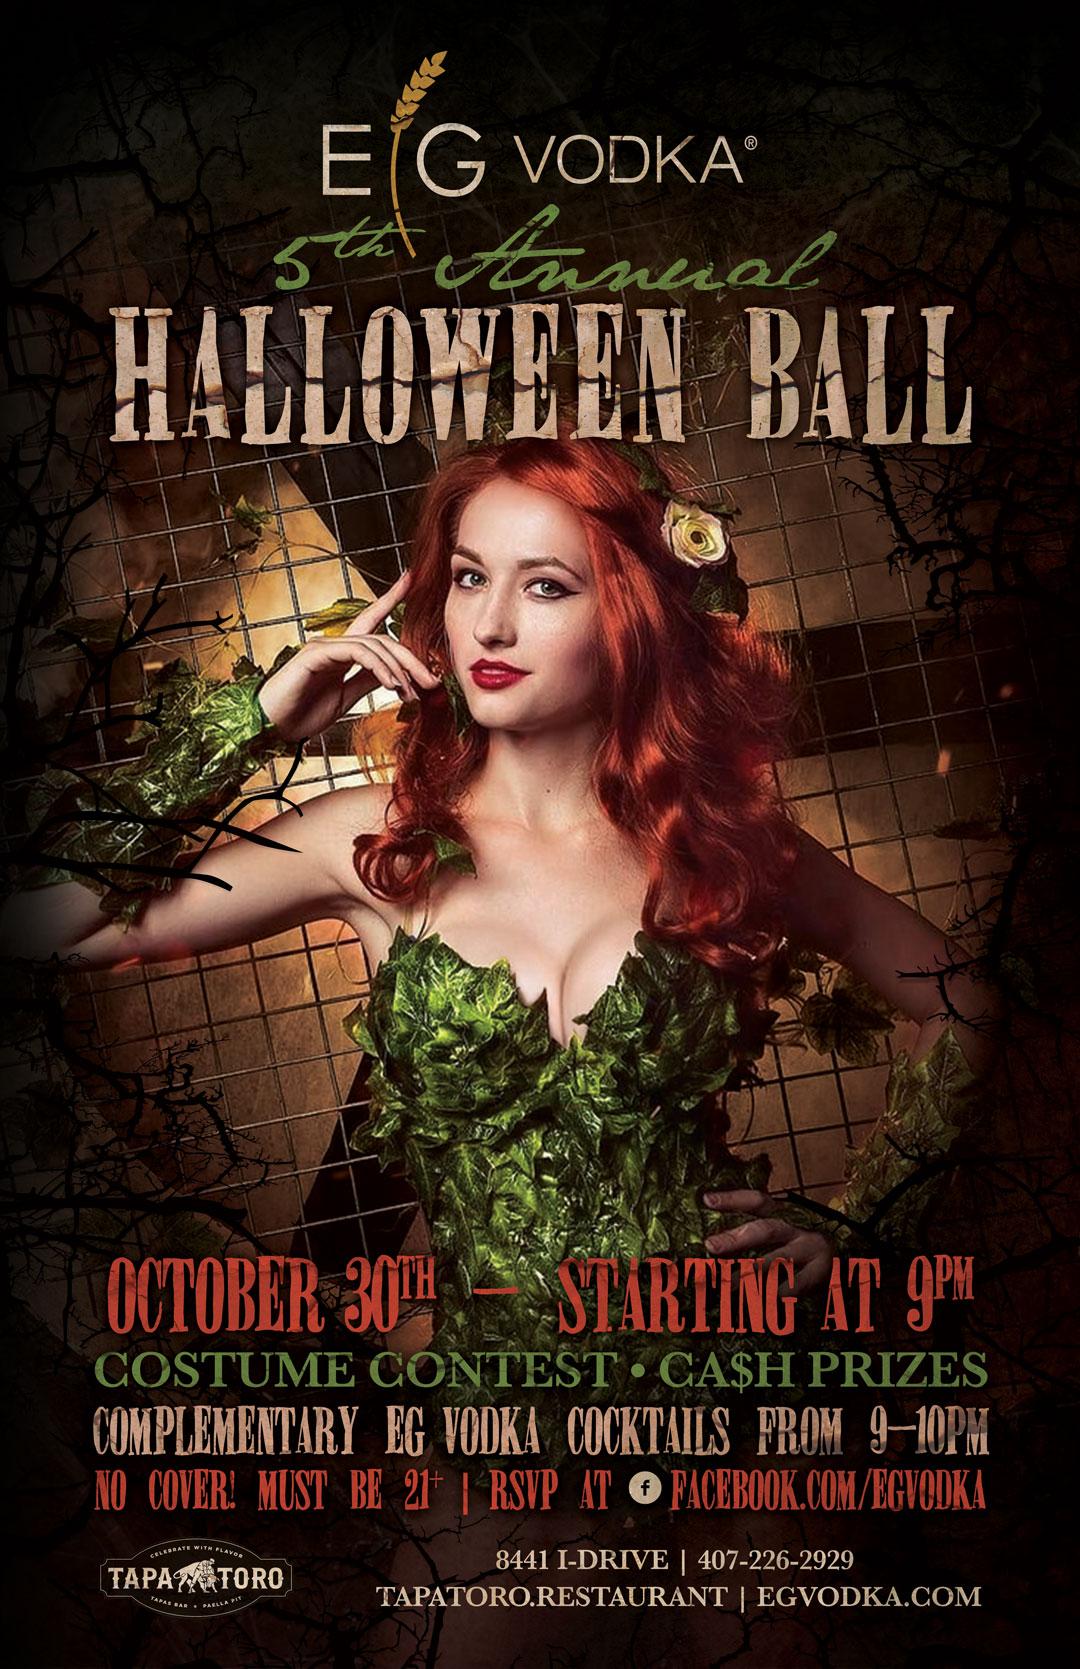 5th Annual EG Vodka Halloween Ball Image